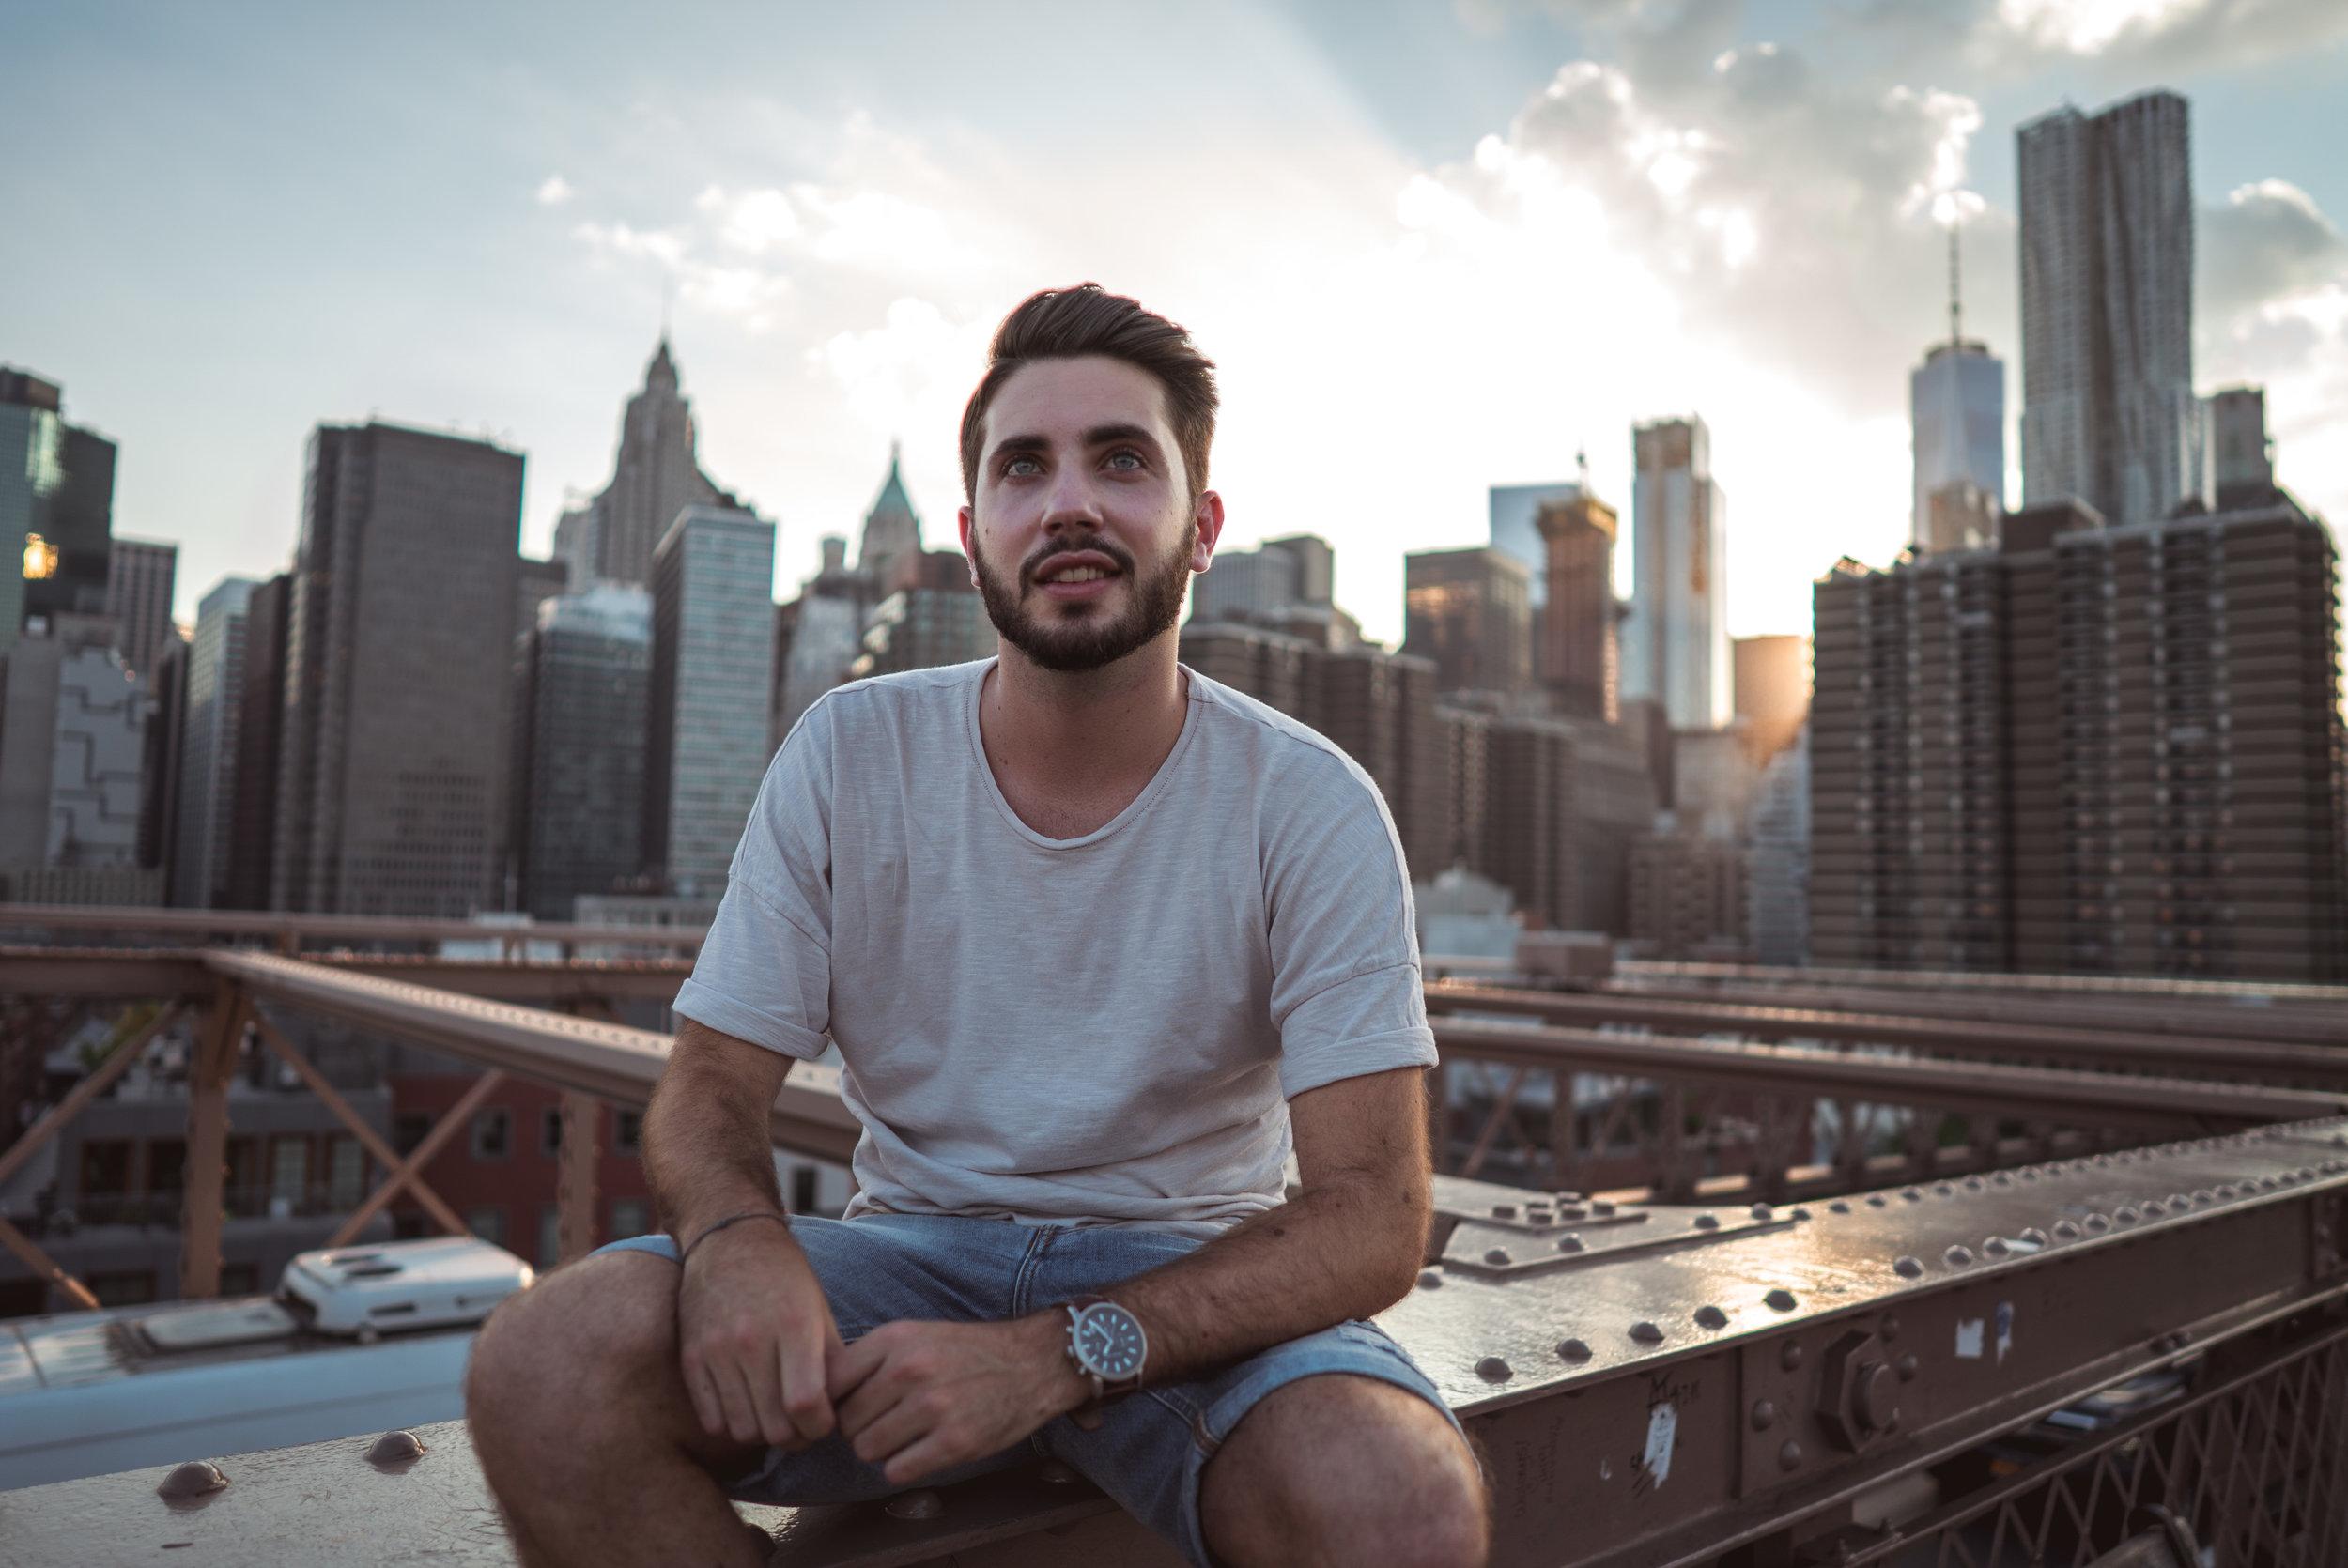 NYC_2017-37.jpg